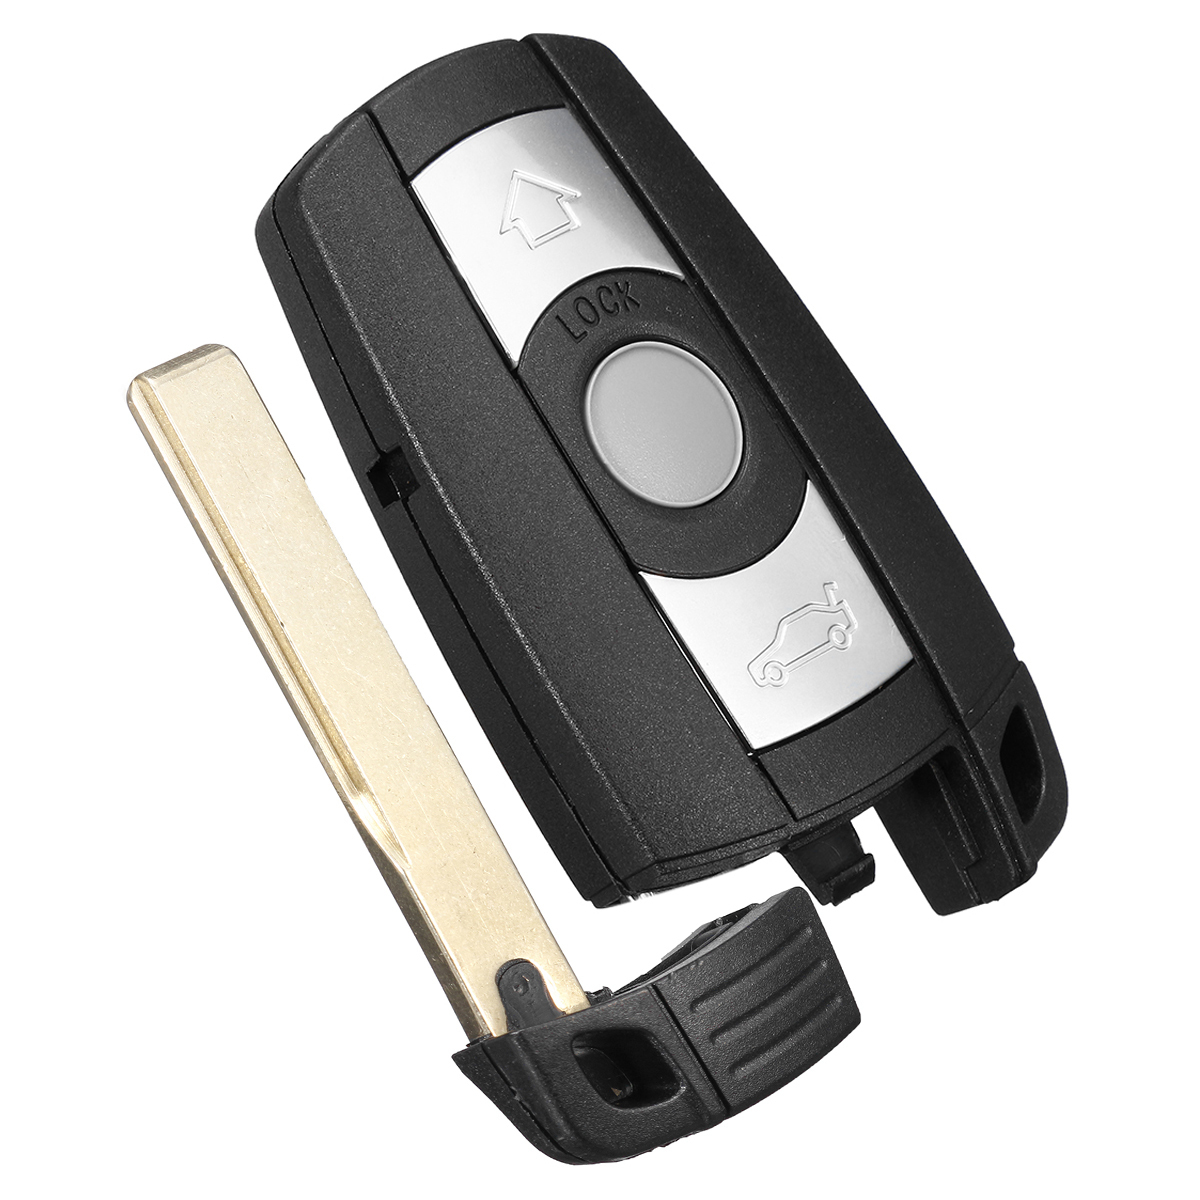 With Blade Battery Remote 3 Button Car Key Shell Case Styling Cover Trim For Bmw 1/3/5/6/7 Series E90 E92 E93 E60 E61 X1 X5 X6